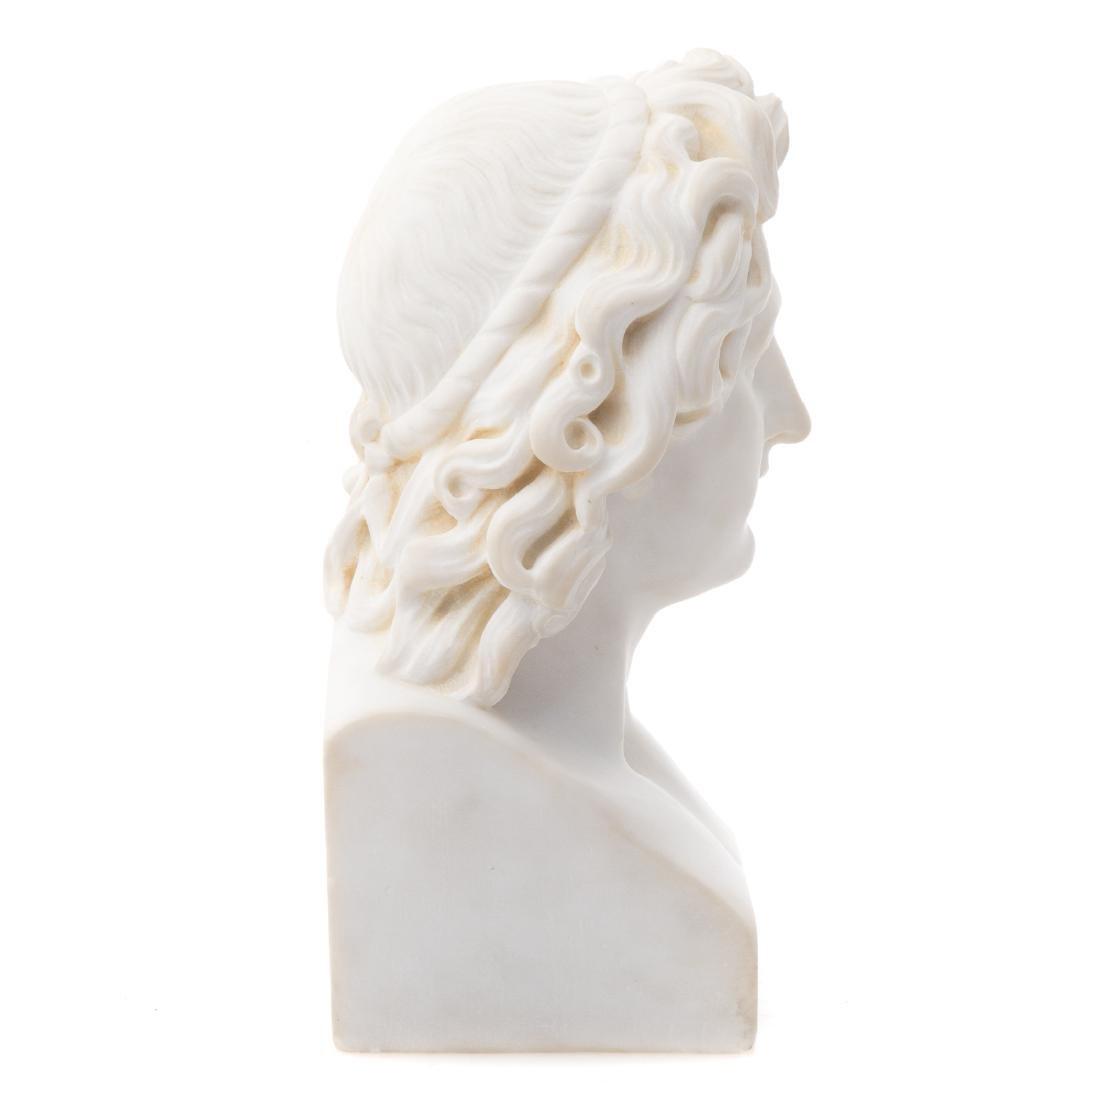 Italian Grande Tour marble bust of Apollo - 4